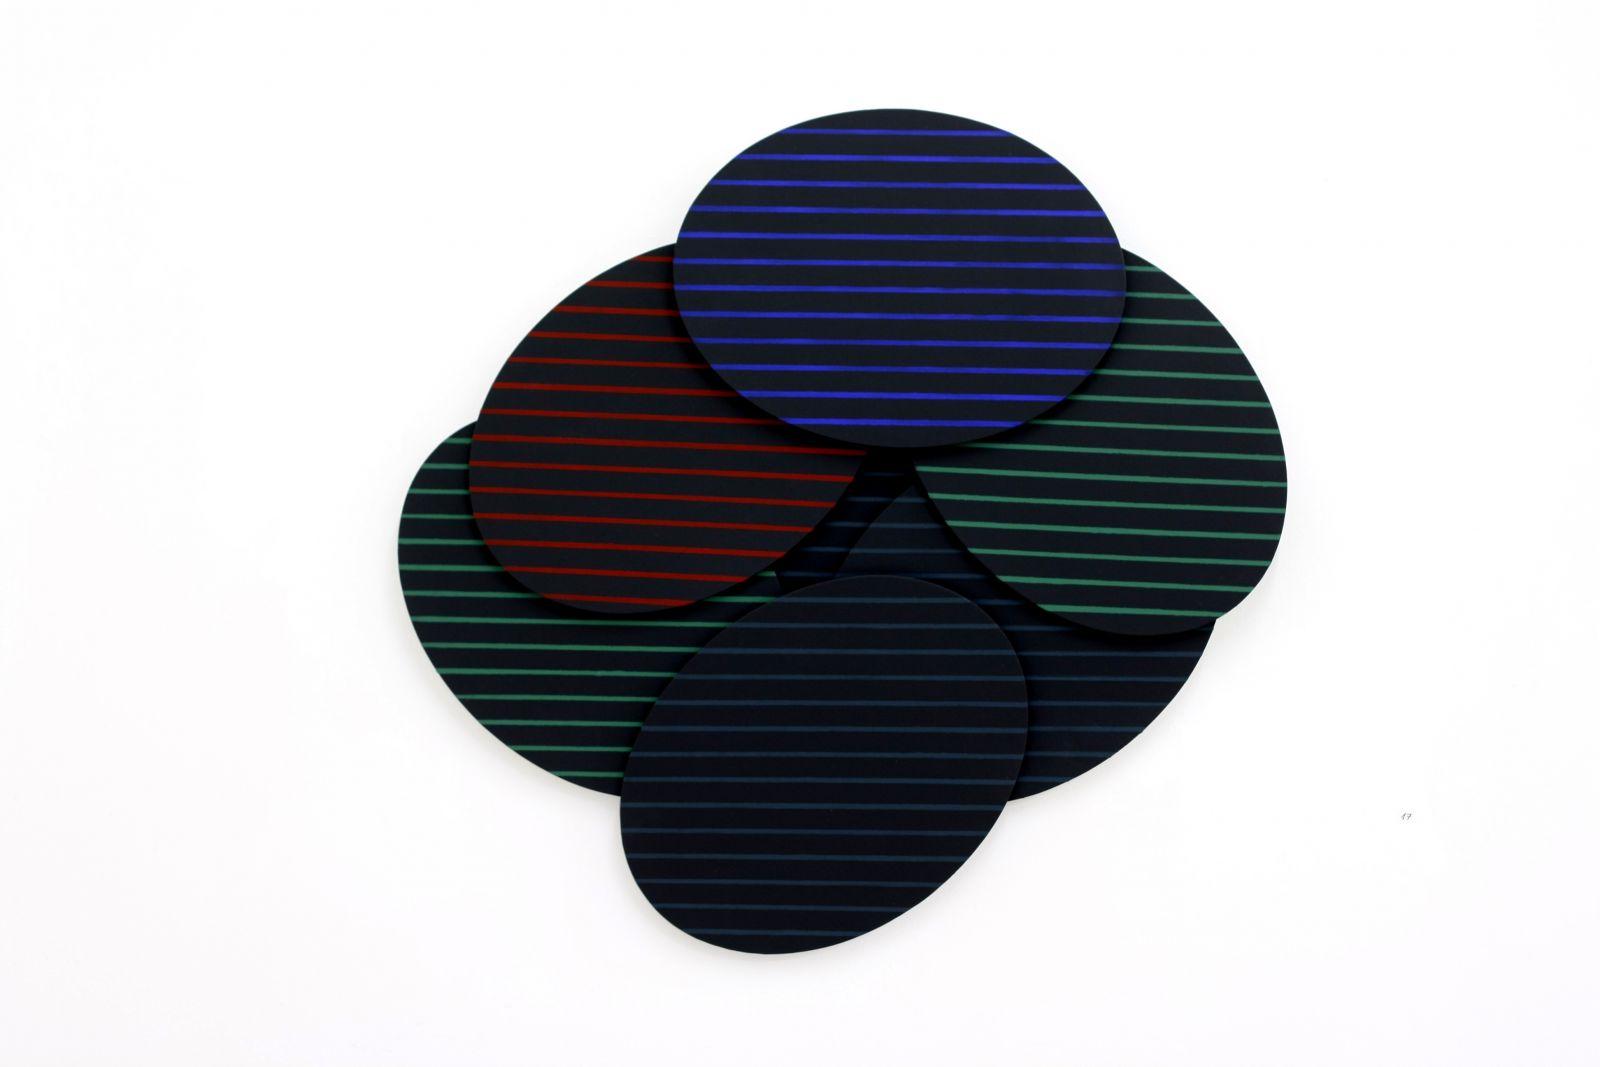 Ovalformation, Acryl auf Leinwand/ Karton, 80 x 80 cm, Christian Eder